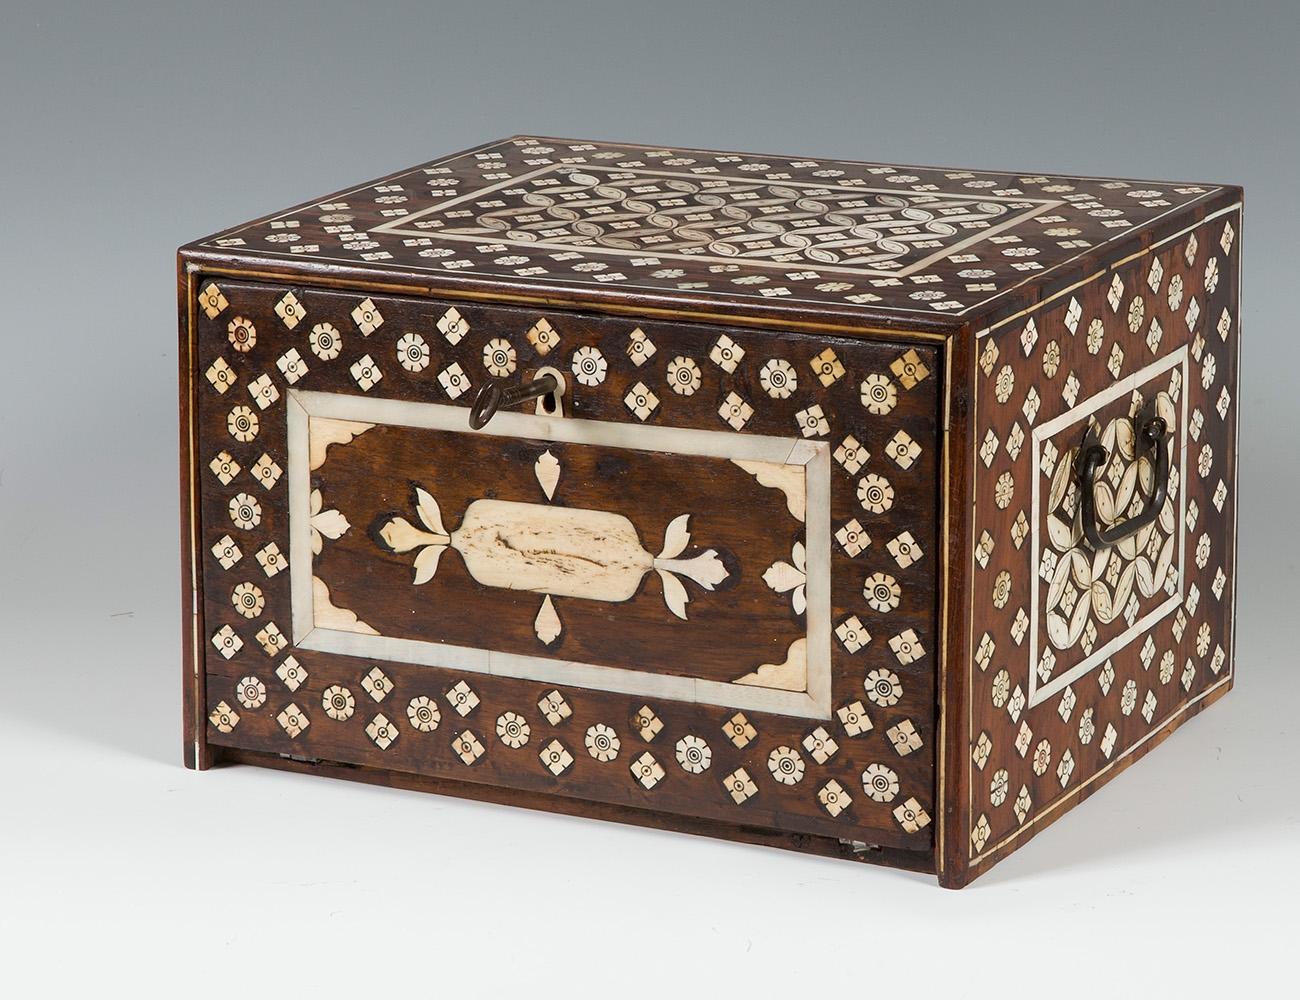 Pequeño bargueño; India, siglo XVII.